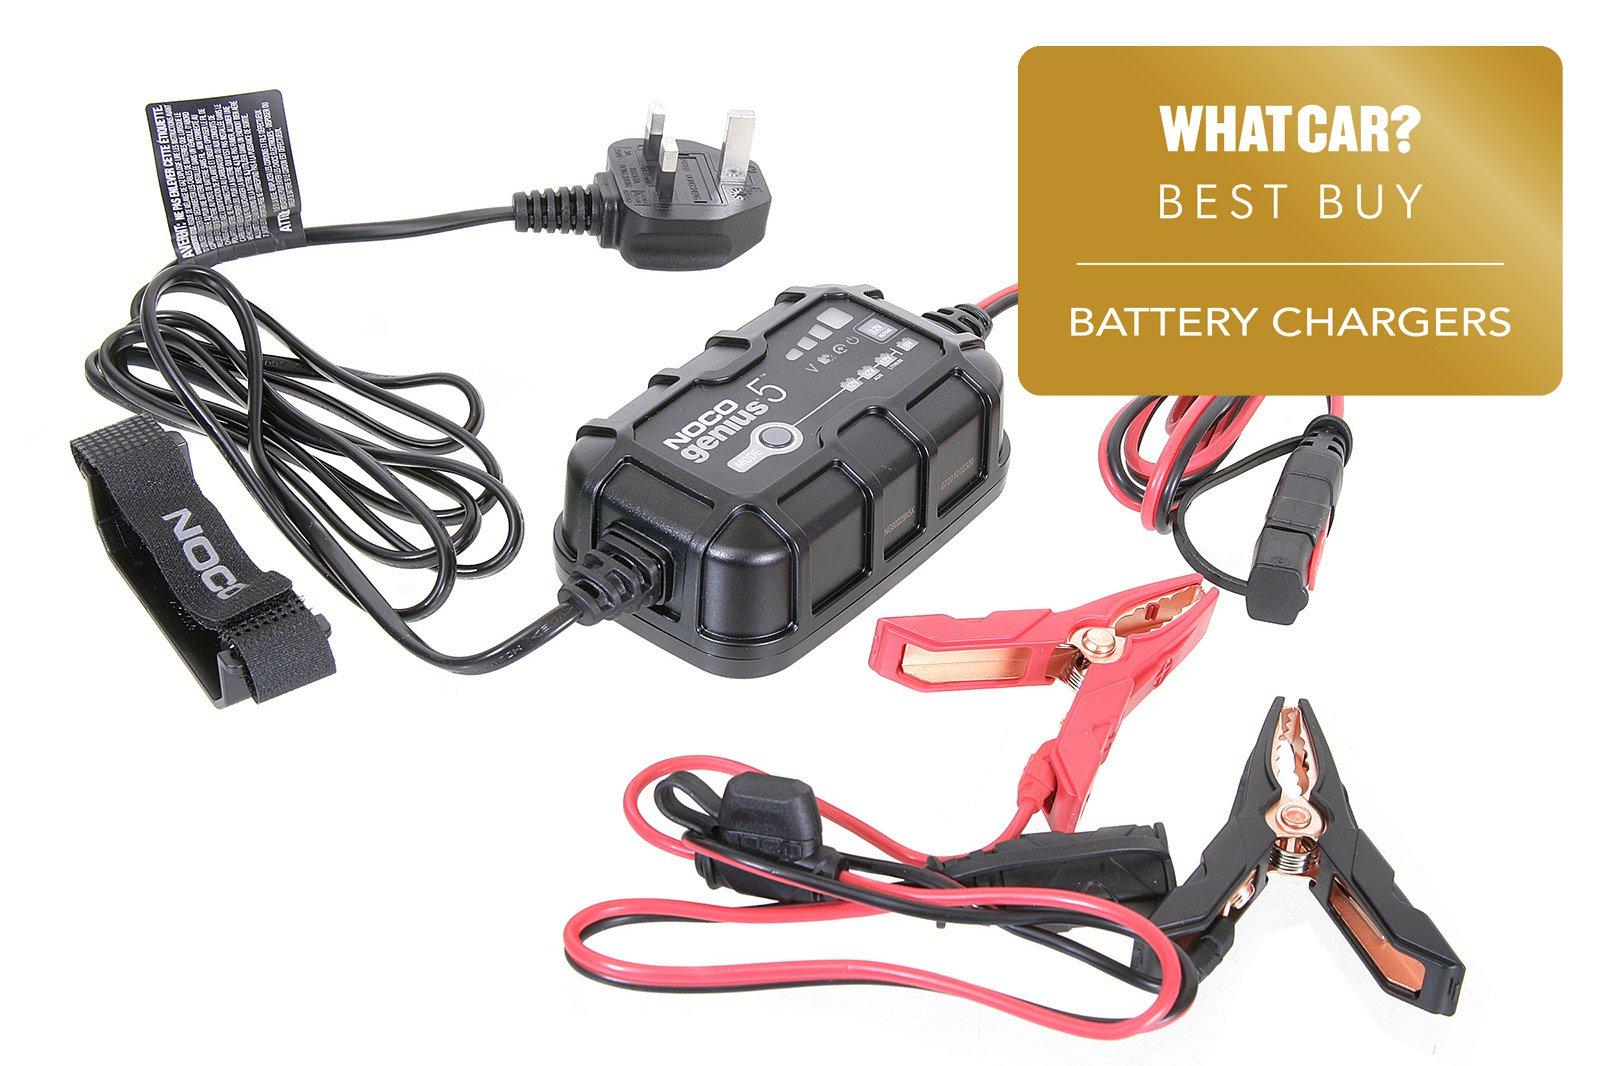 Smart Battery Chargers 2021 - NOCO Genius5UK